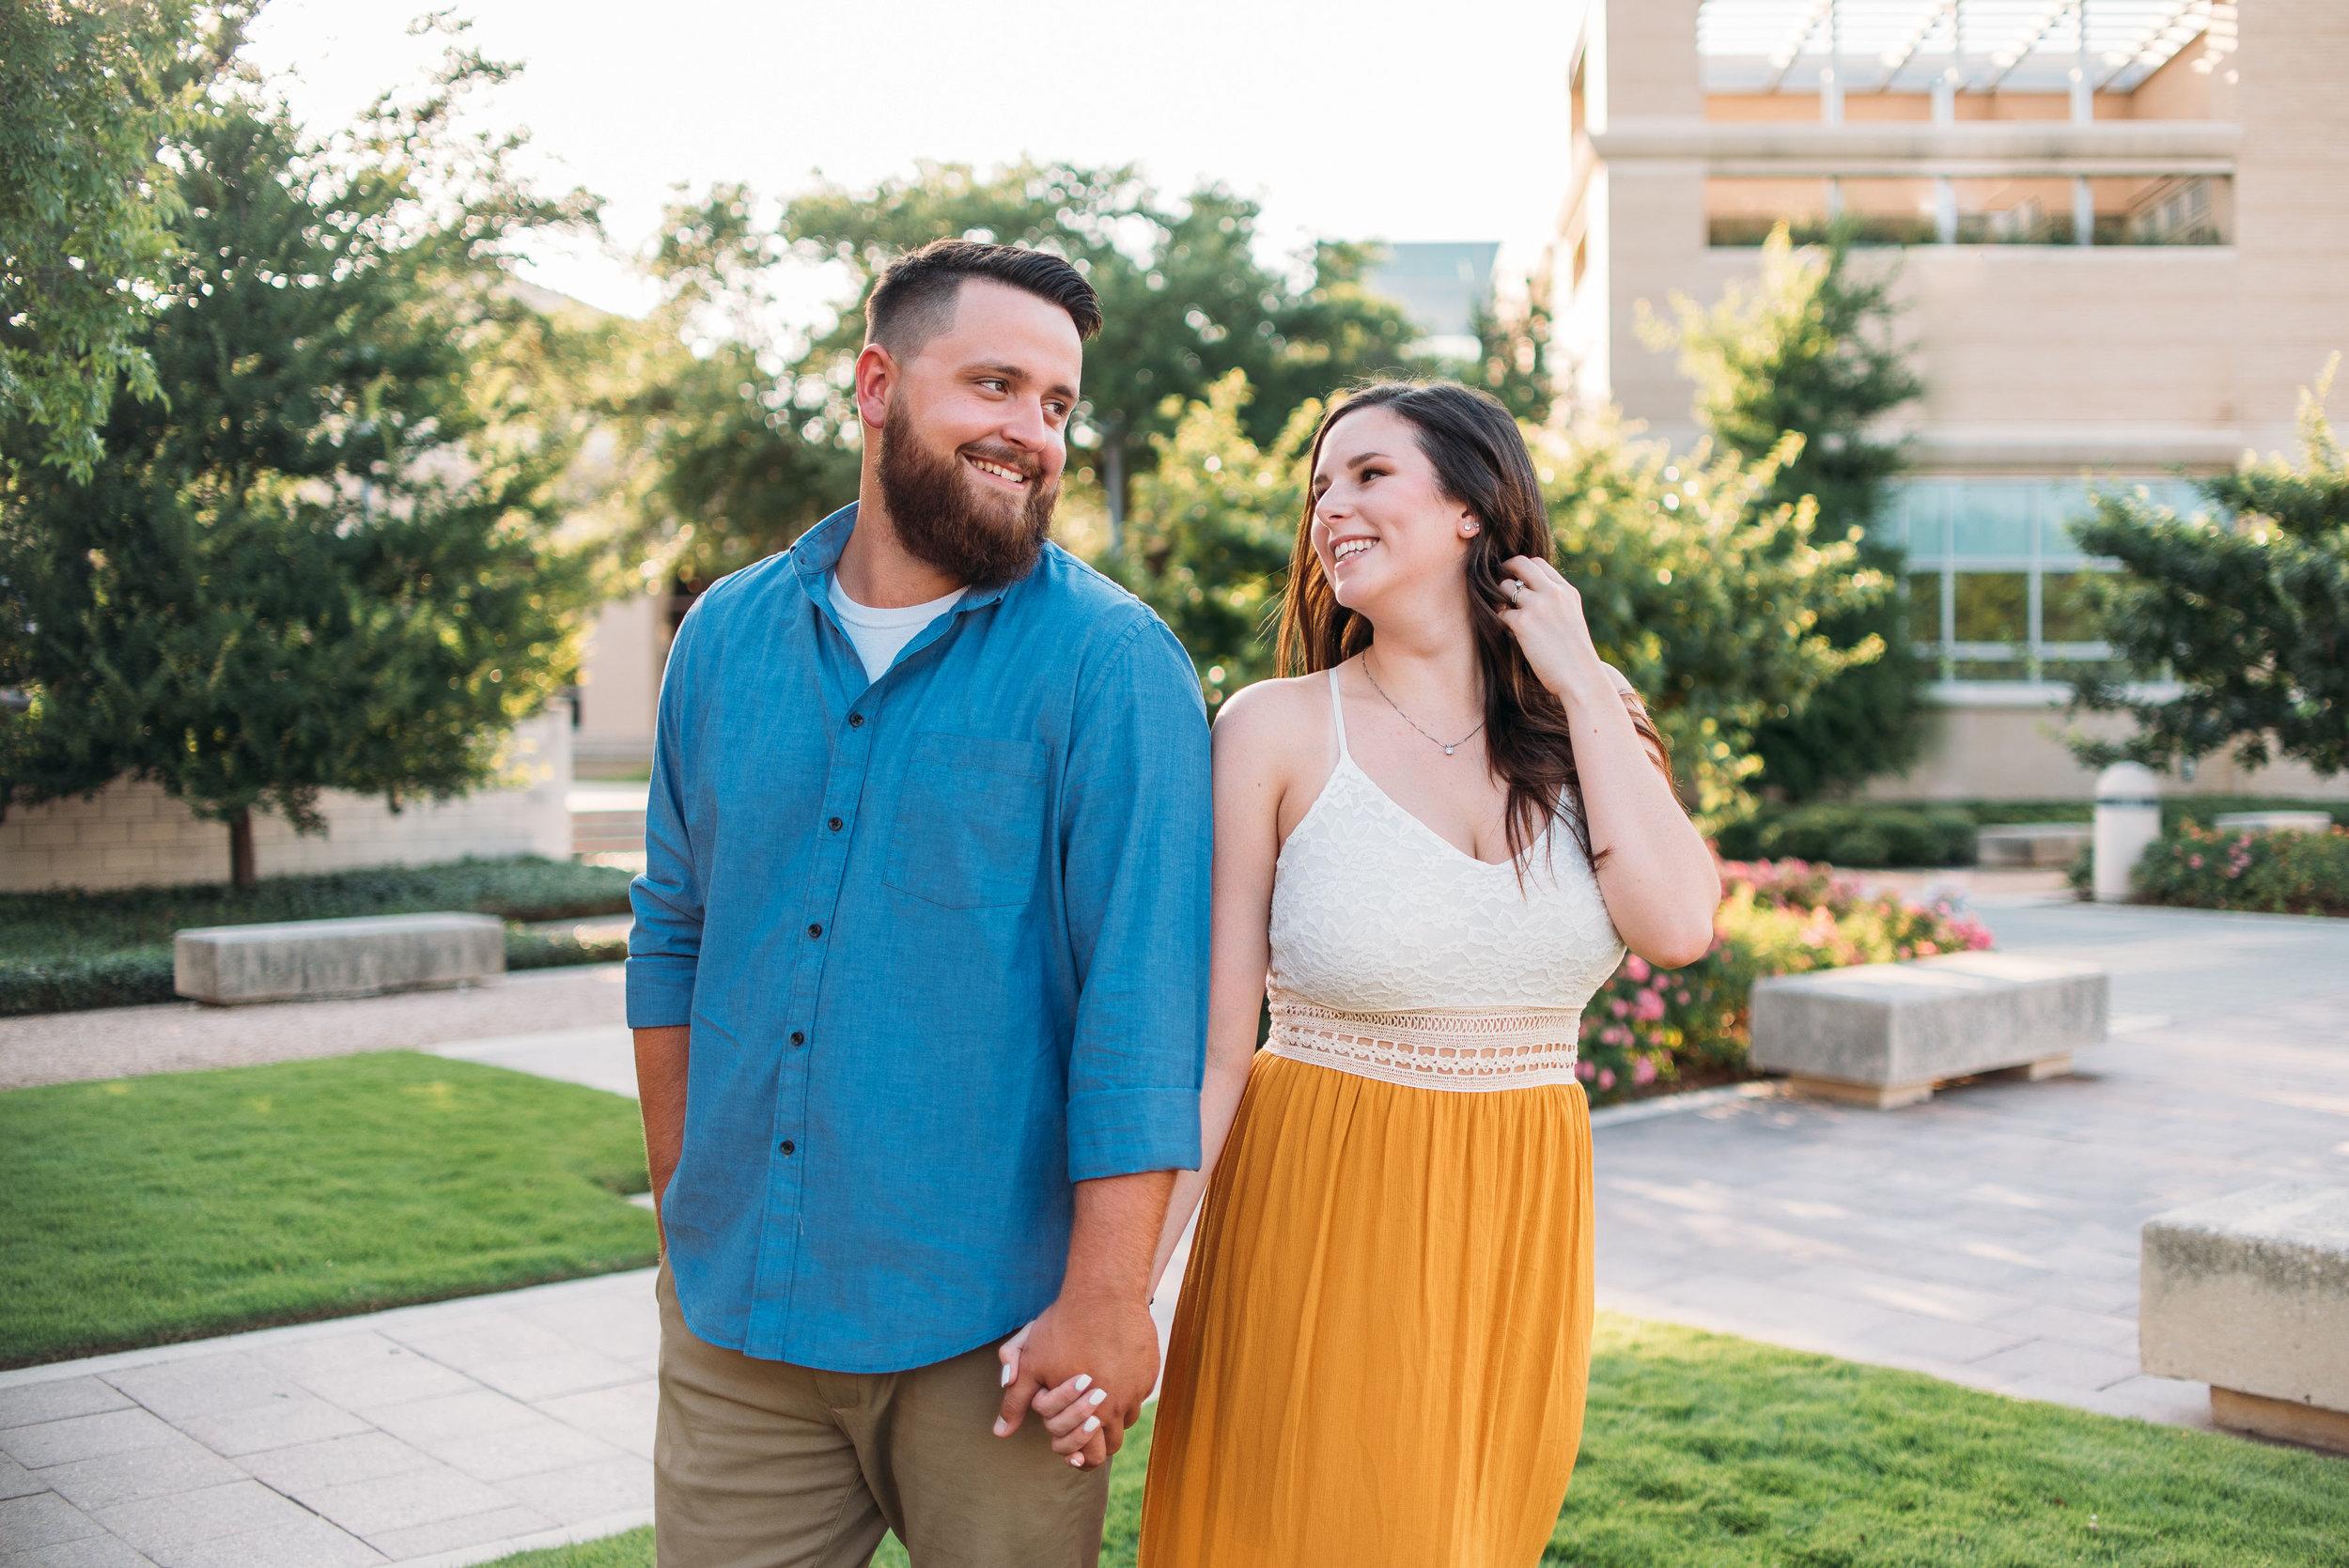 George-Bush-Library-Texas-A&M-University-Engagement-College-Station-Wedding-Photographer-San-Angel-Photo-Mark-Jenna-Matt-Century-Tree-11.jpg